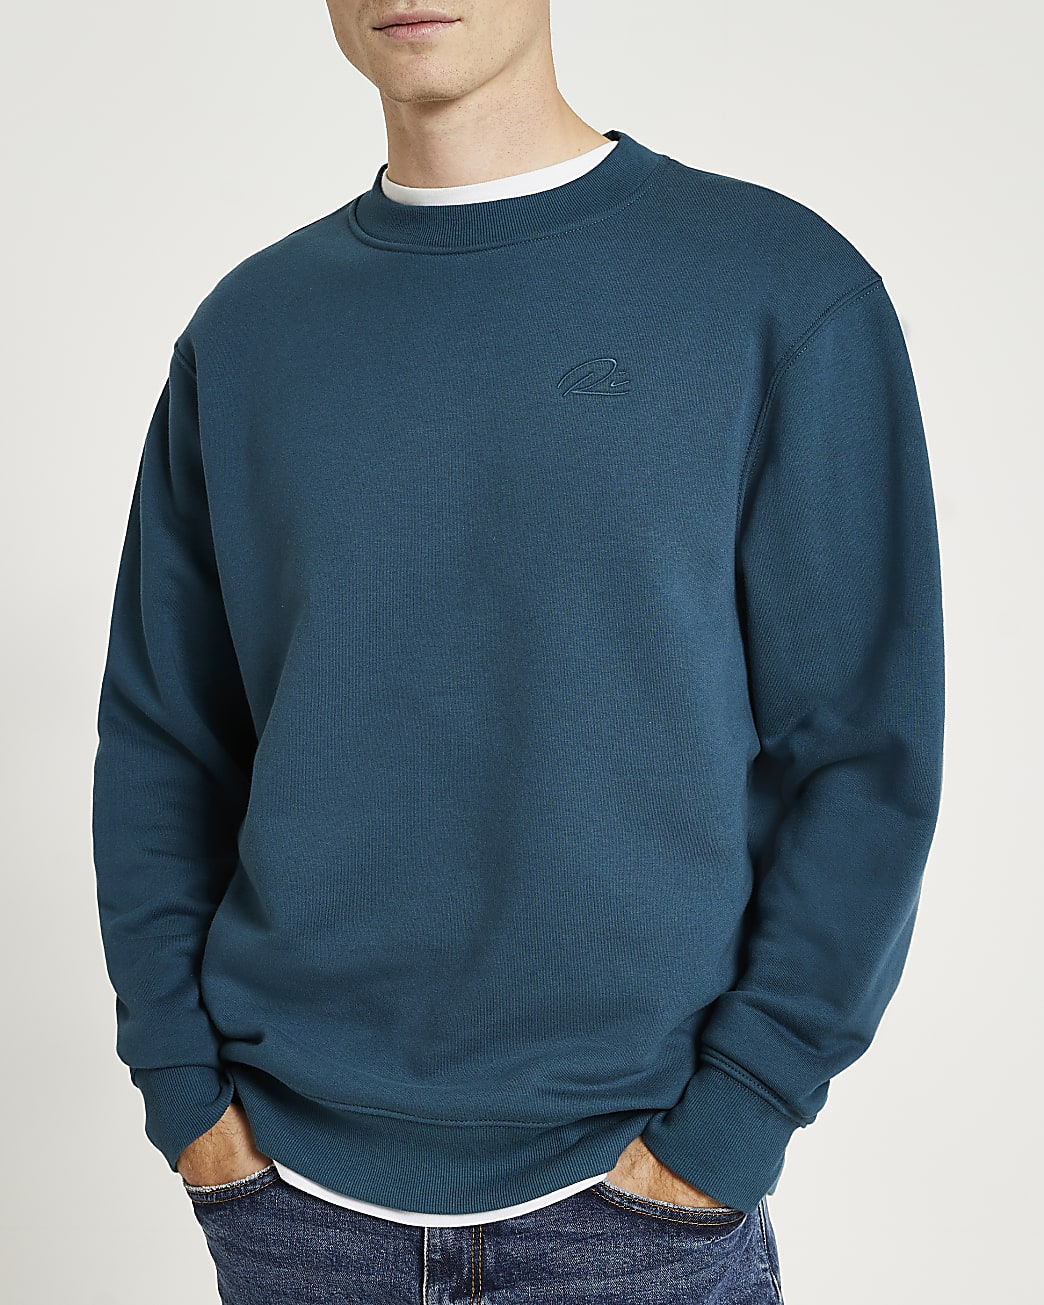 Green RI embroidered regular fit sweatshirt